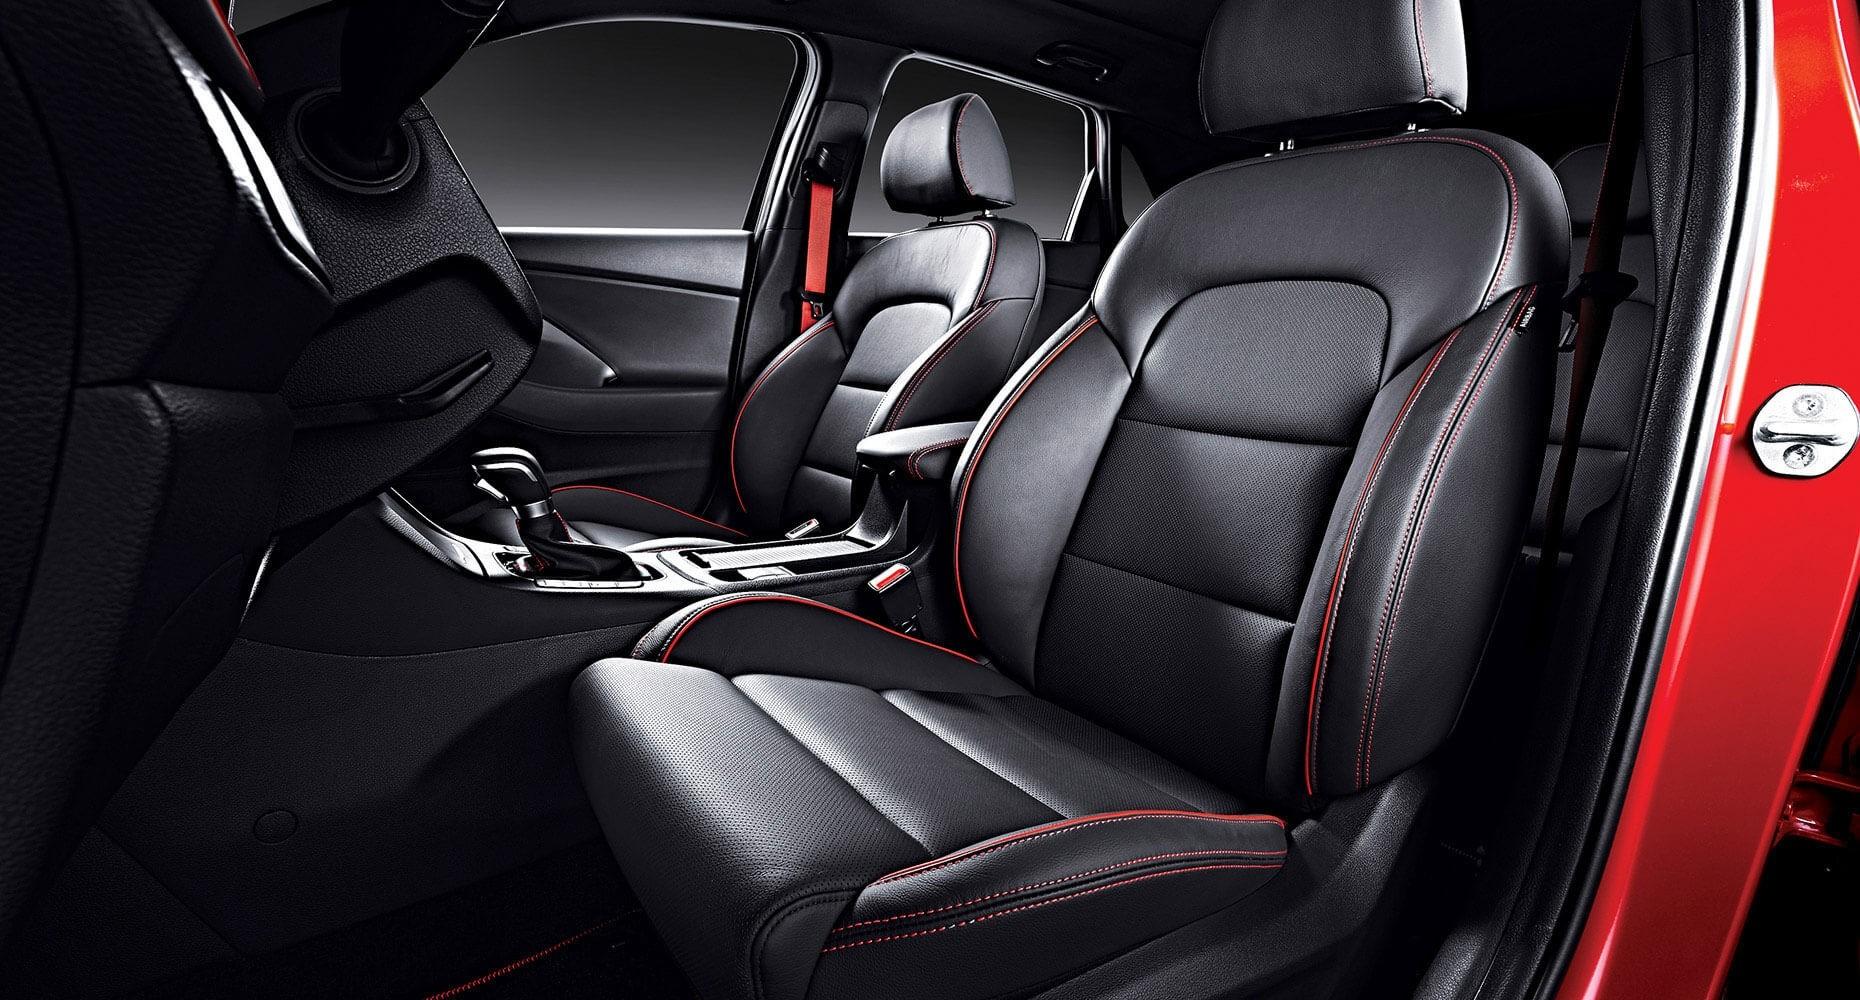 2018 Hyundai Elantra GT seats